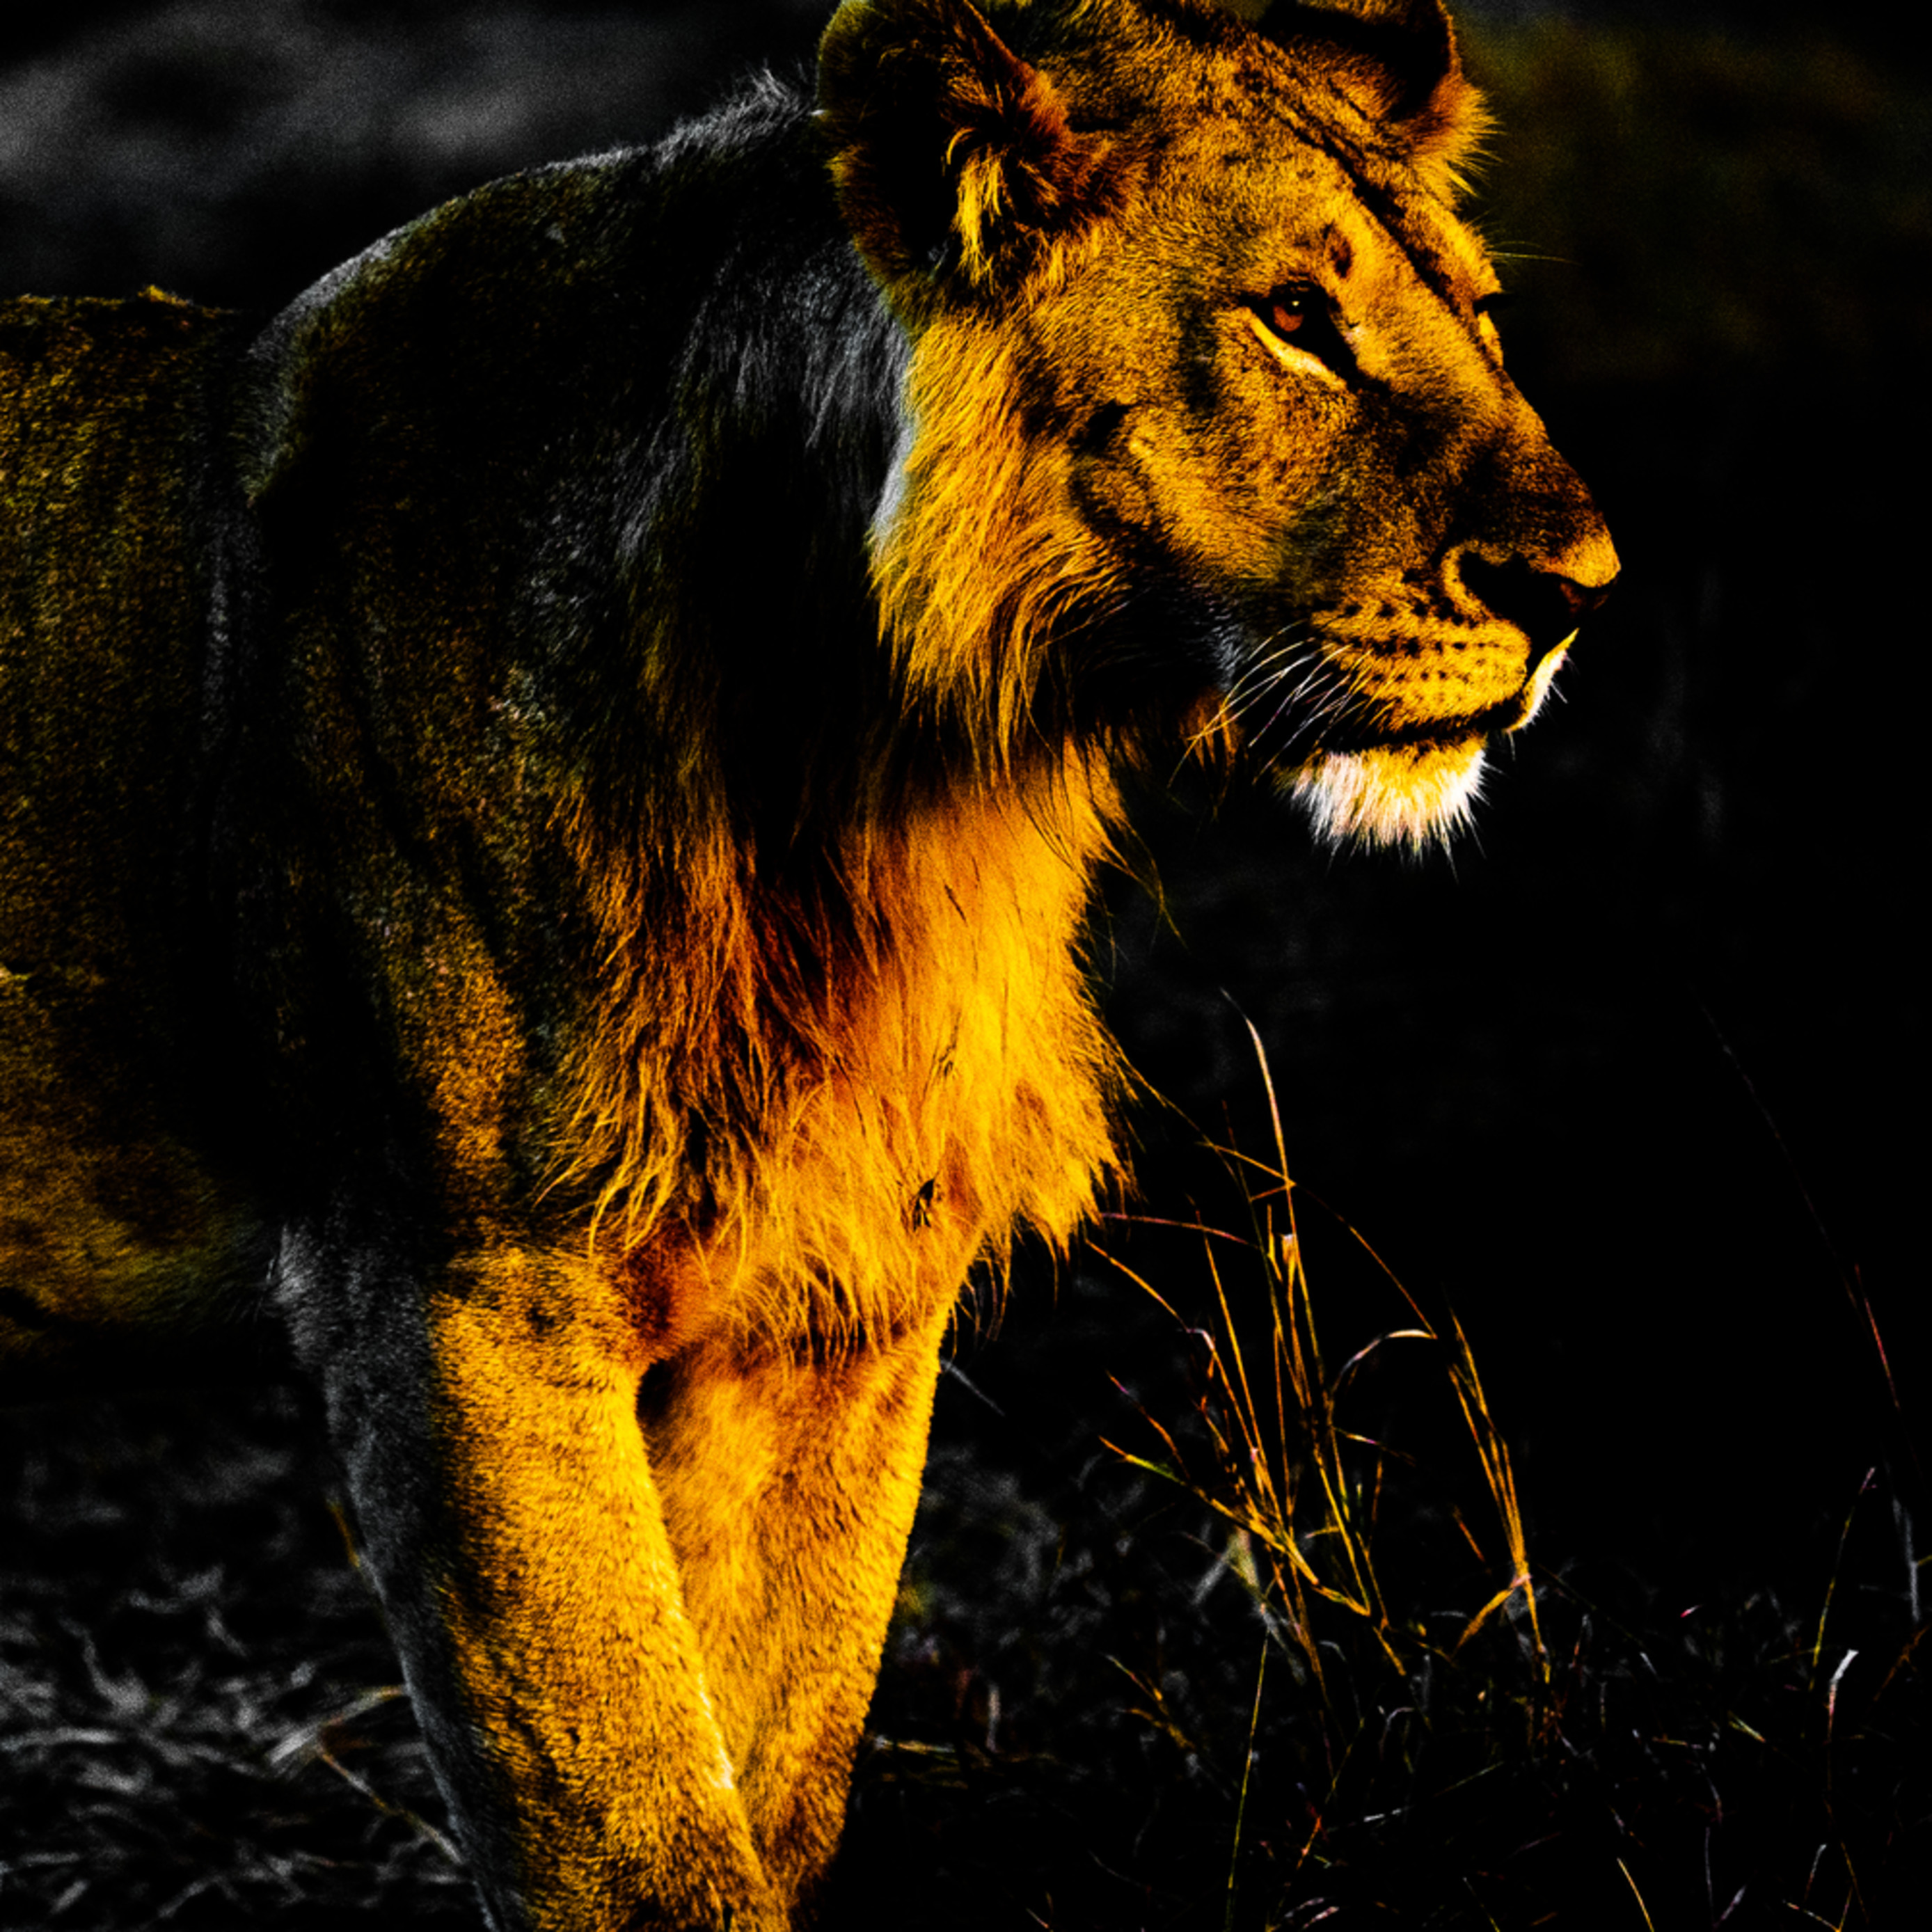 Africa   kenya august 08 201807117 z7wk95